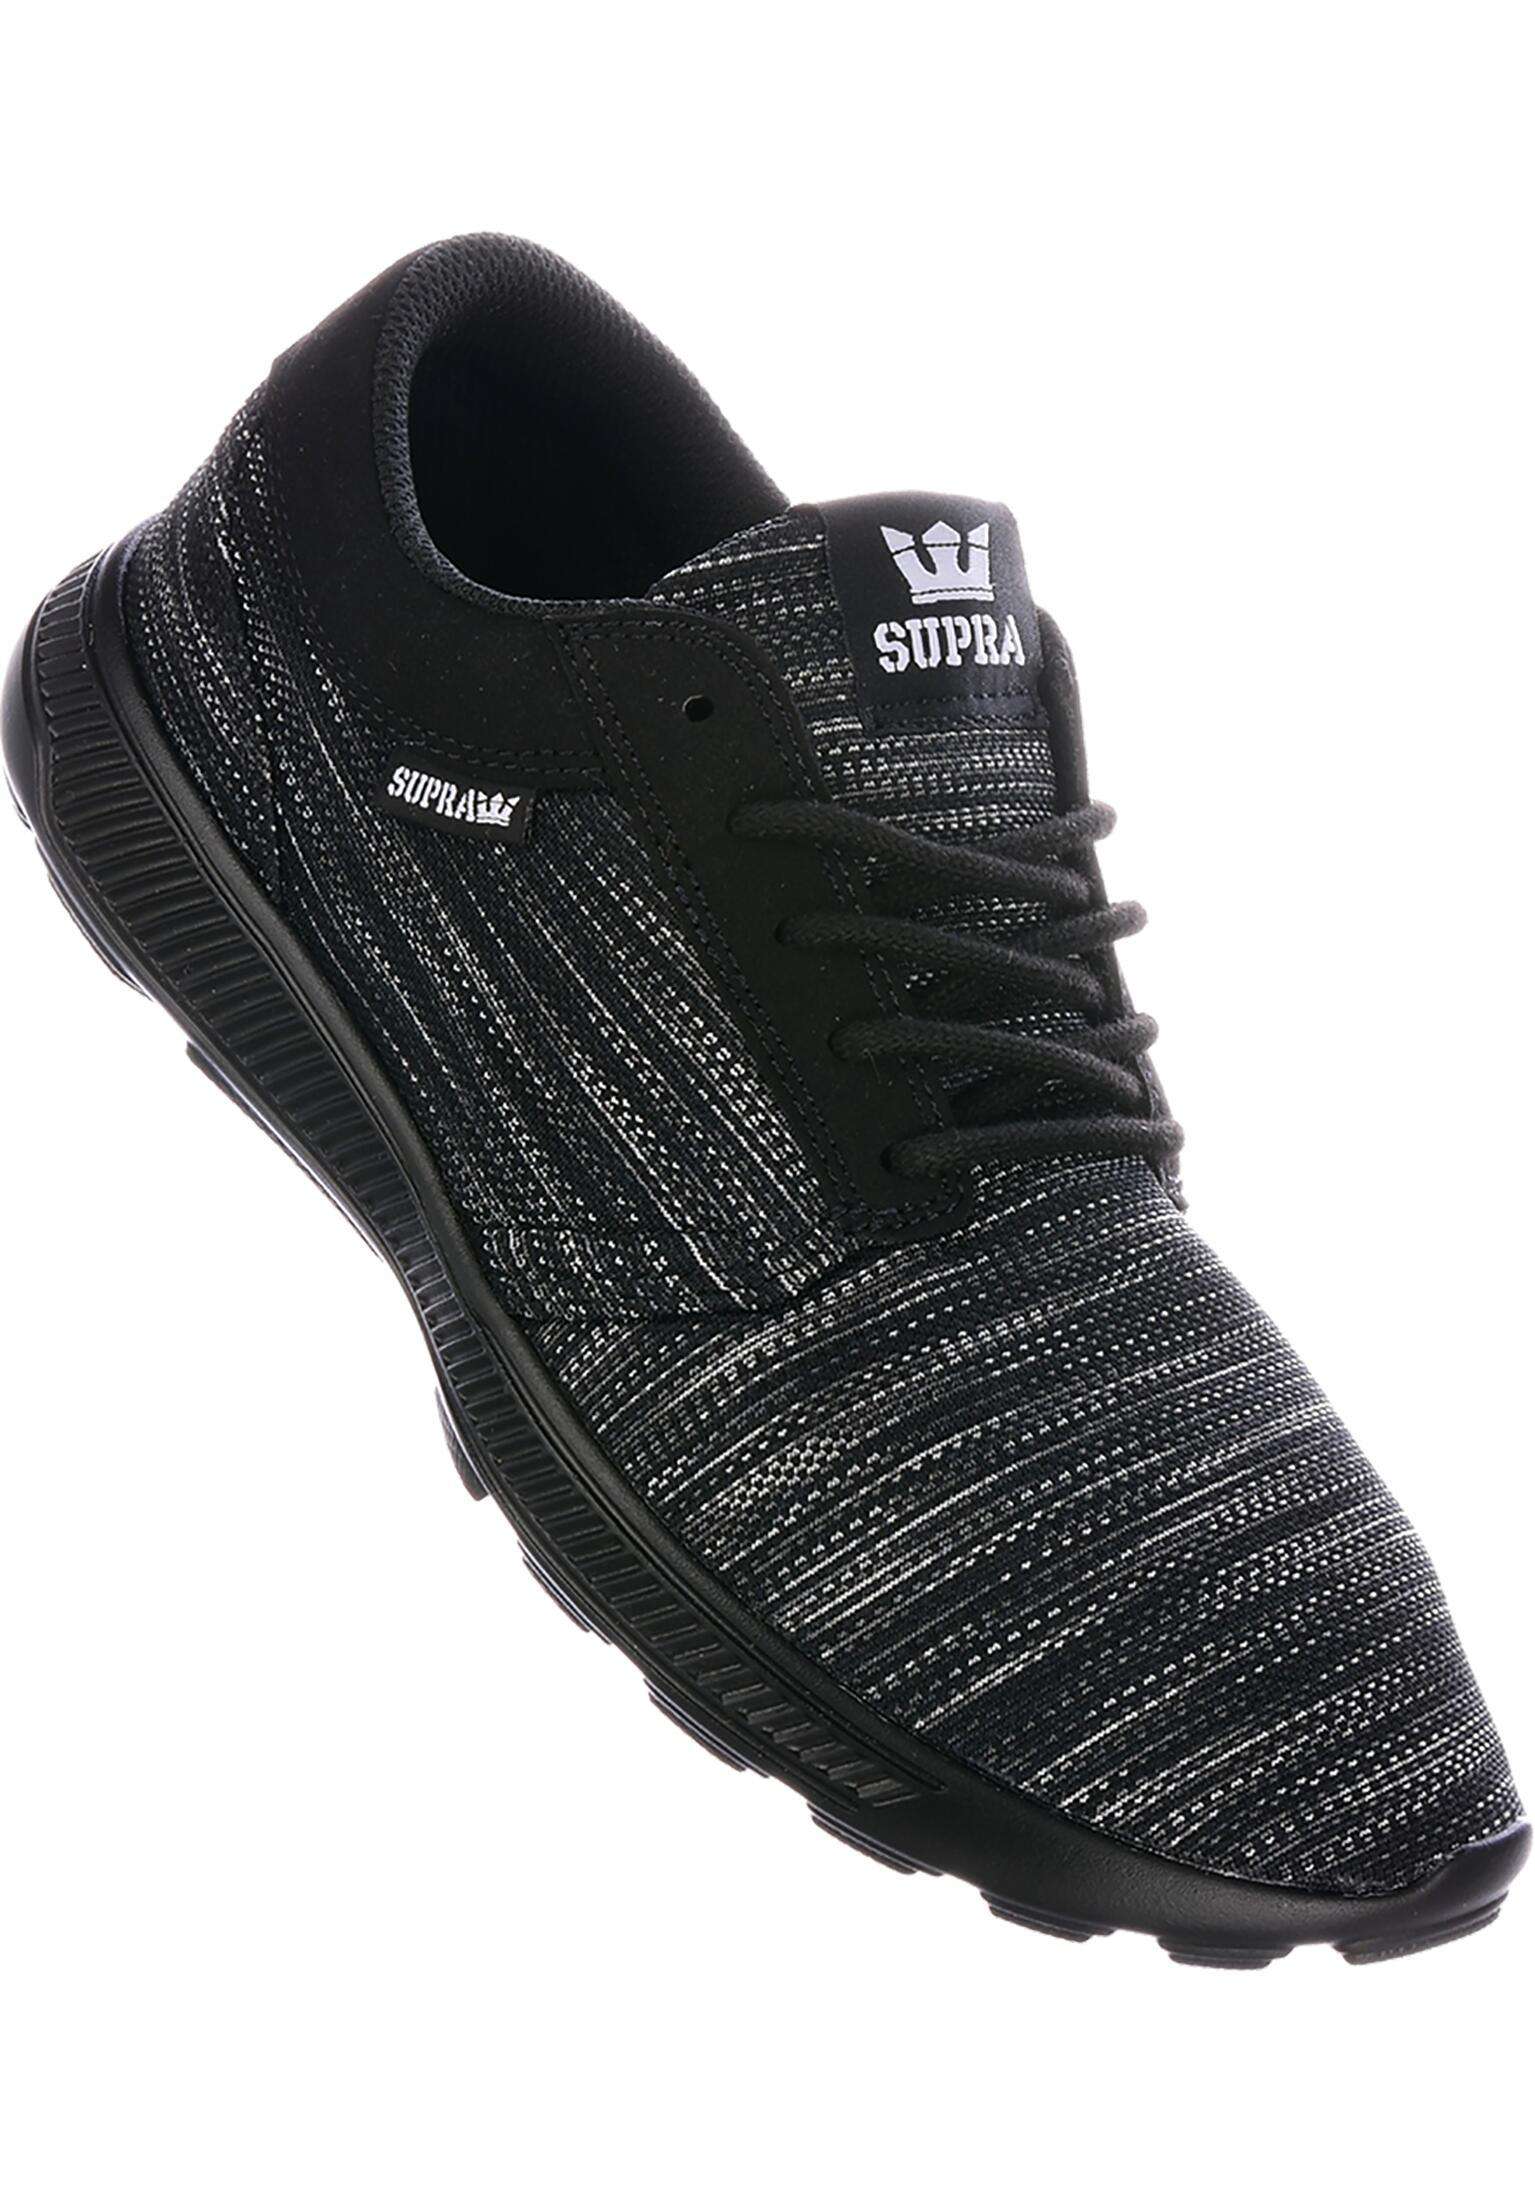 Hammer Run Supra All Shoes in multi-black for Men  707b87fe1a